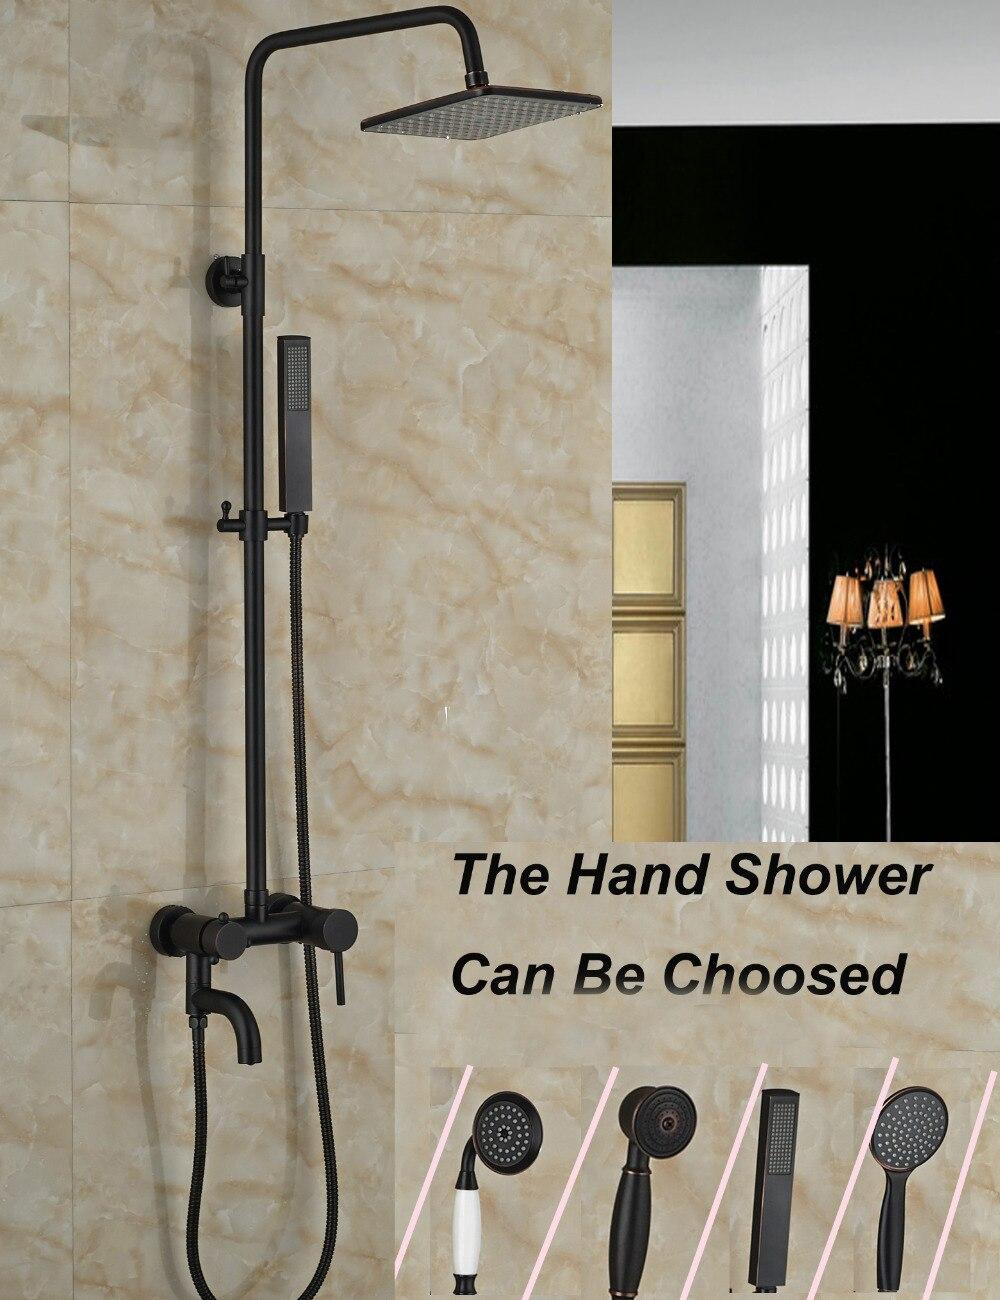 Luxury Rain Square Shower Head Shower Faucet Single Handle Swivel Spout Tap W/ Hand Sprayer Oil Rubbed Bronze